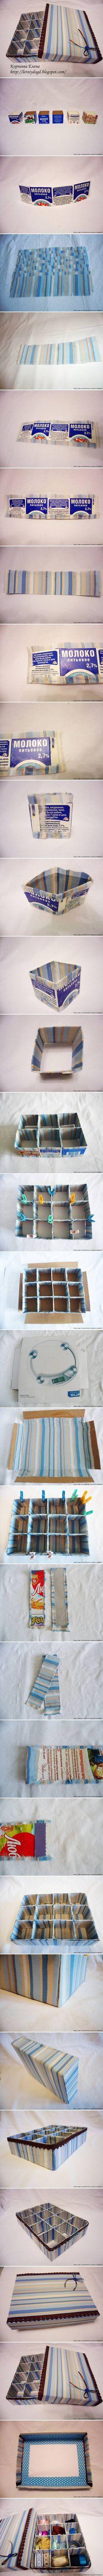 DIY Organizer with Divider DIY Projects | UsefulDIY.com Follow Us on Facebook --> https://www.facebook.com/UsefulDiy